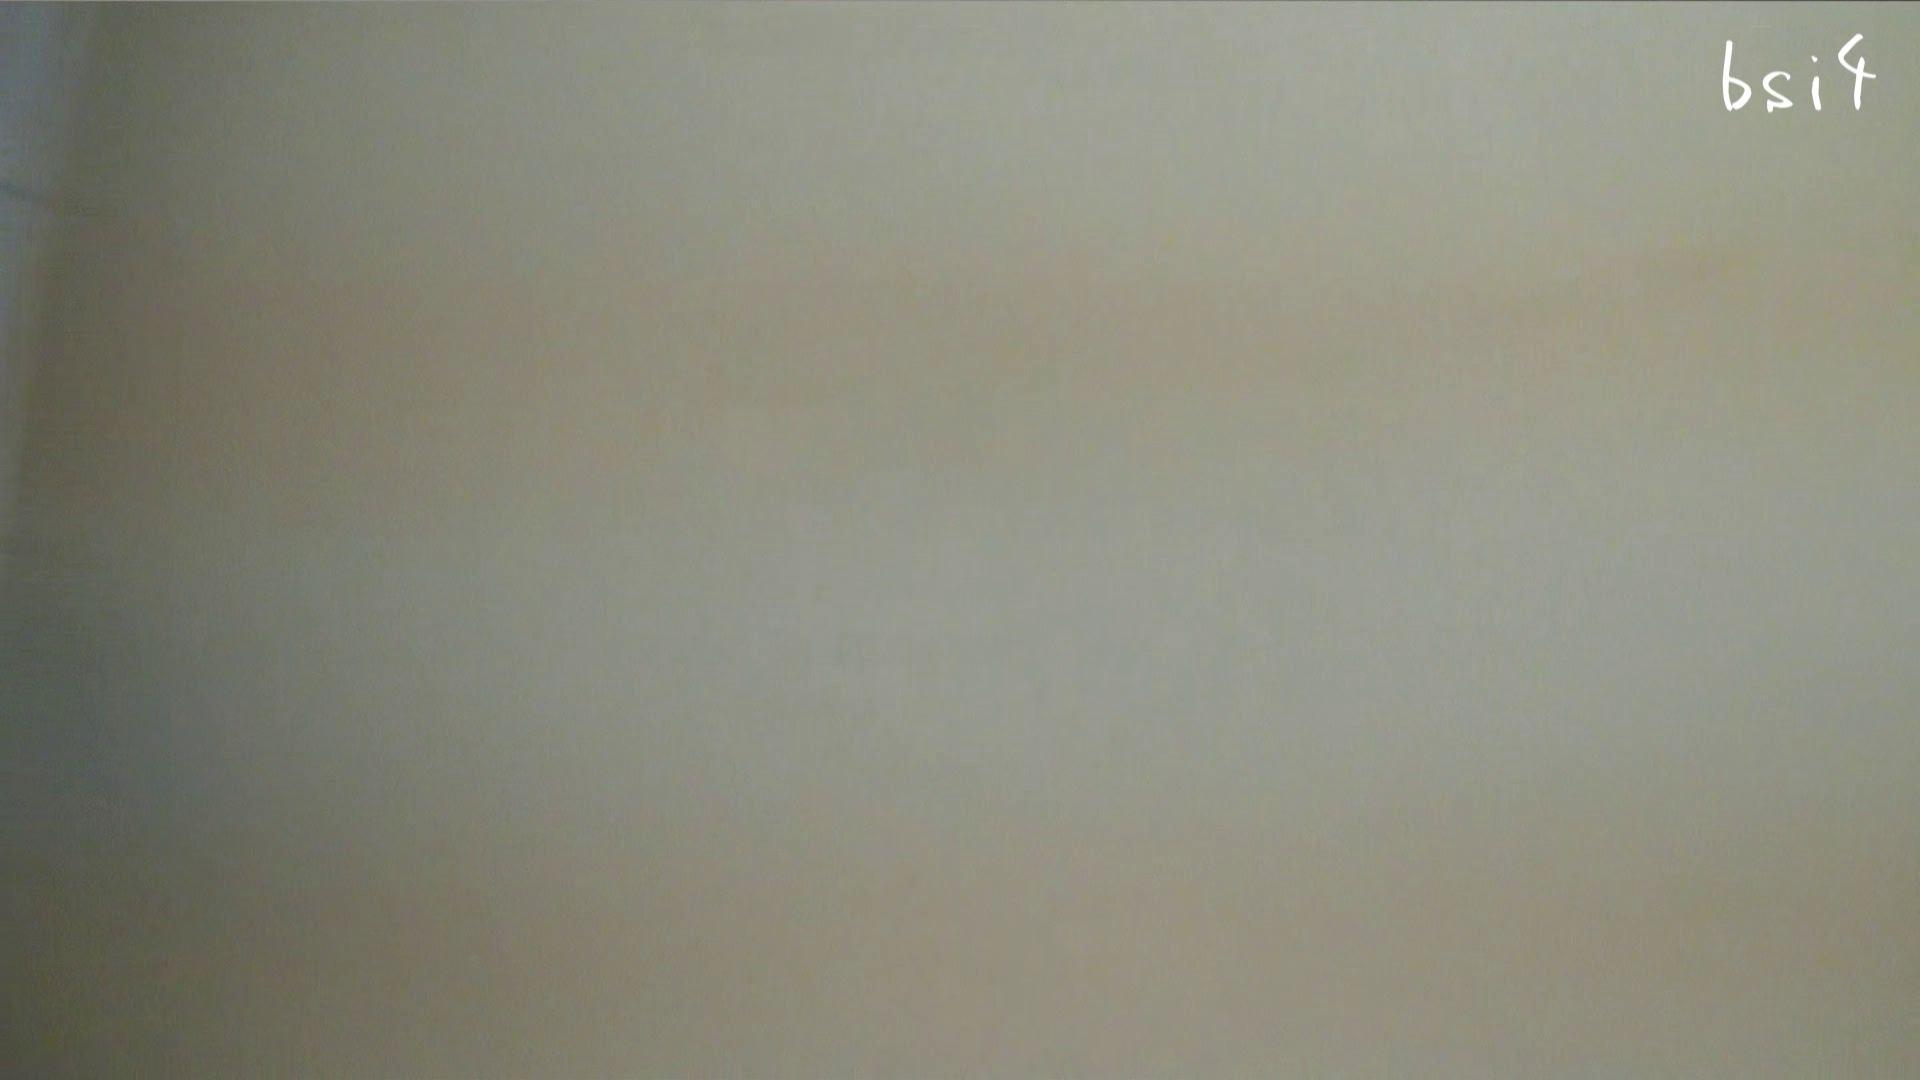 至高下半身盗撮-PREMIUM-【院内病棟編 】VOL4 盛合せ ワレメ無修正動画無料 83枚 2